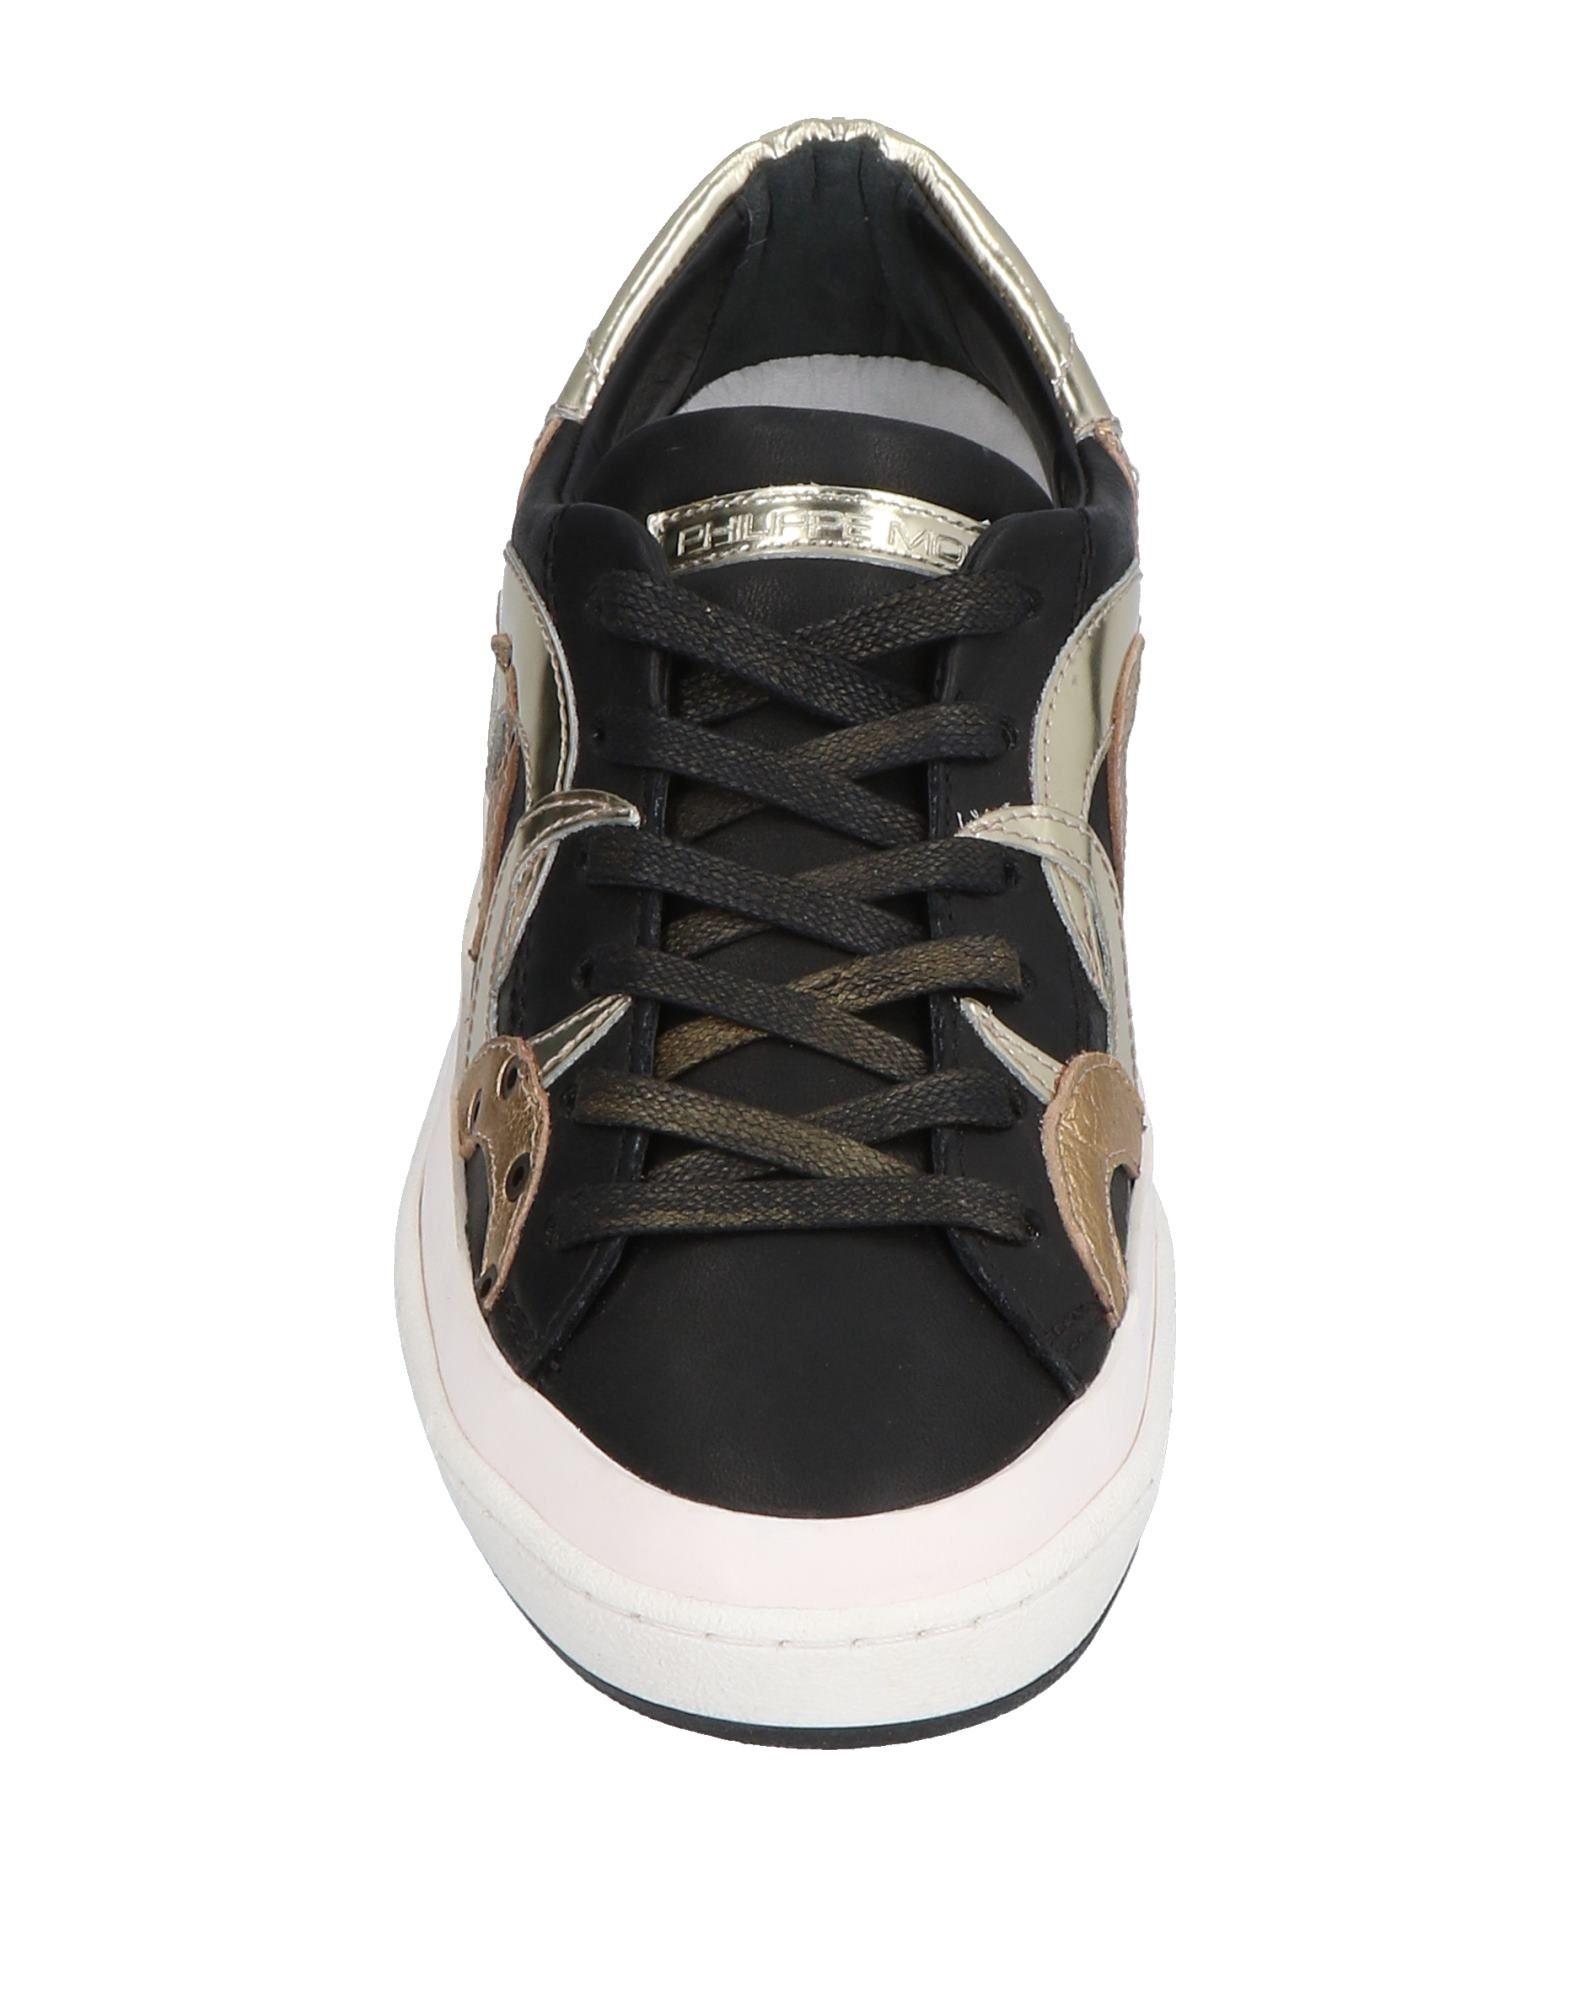 Philippe Model Sneakers Damen  11478585MPGut aussehende strapazierfähige Schuhe